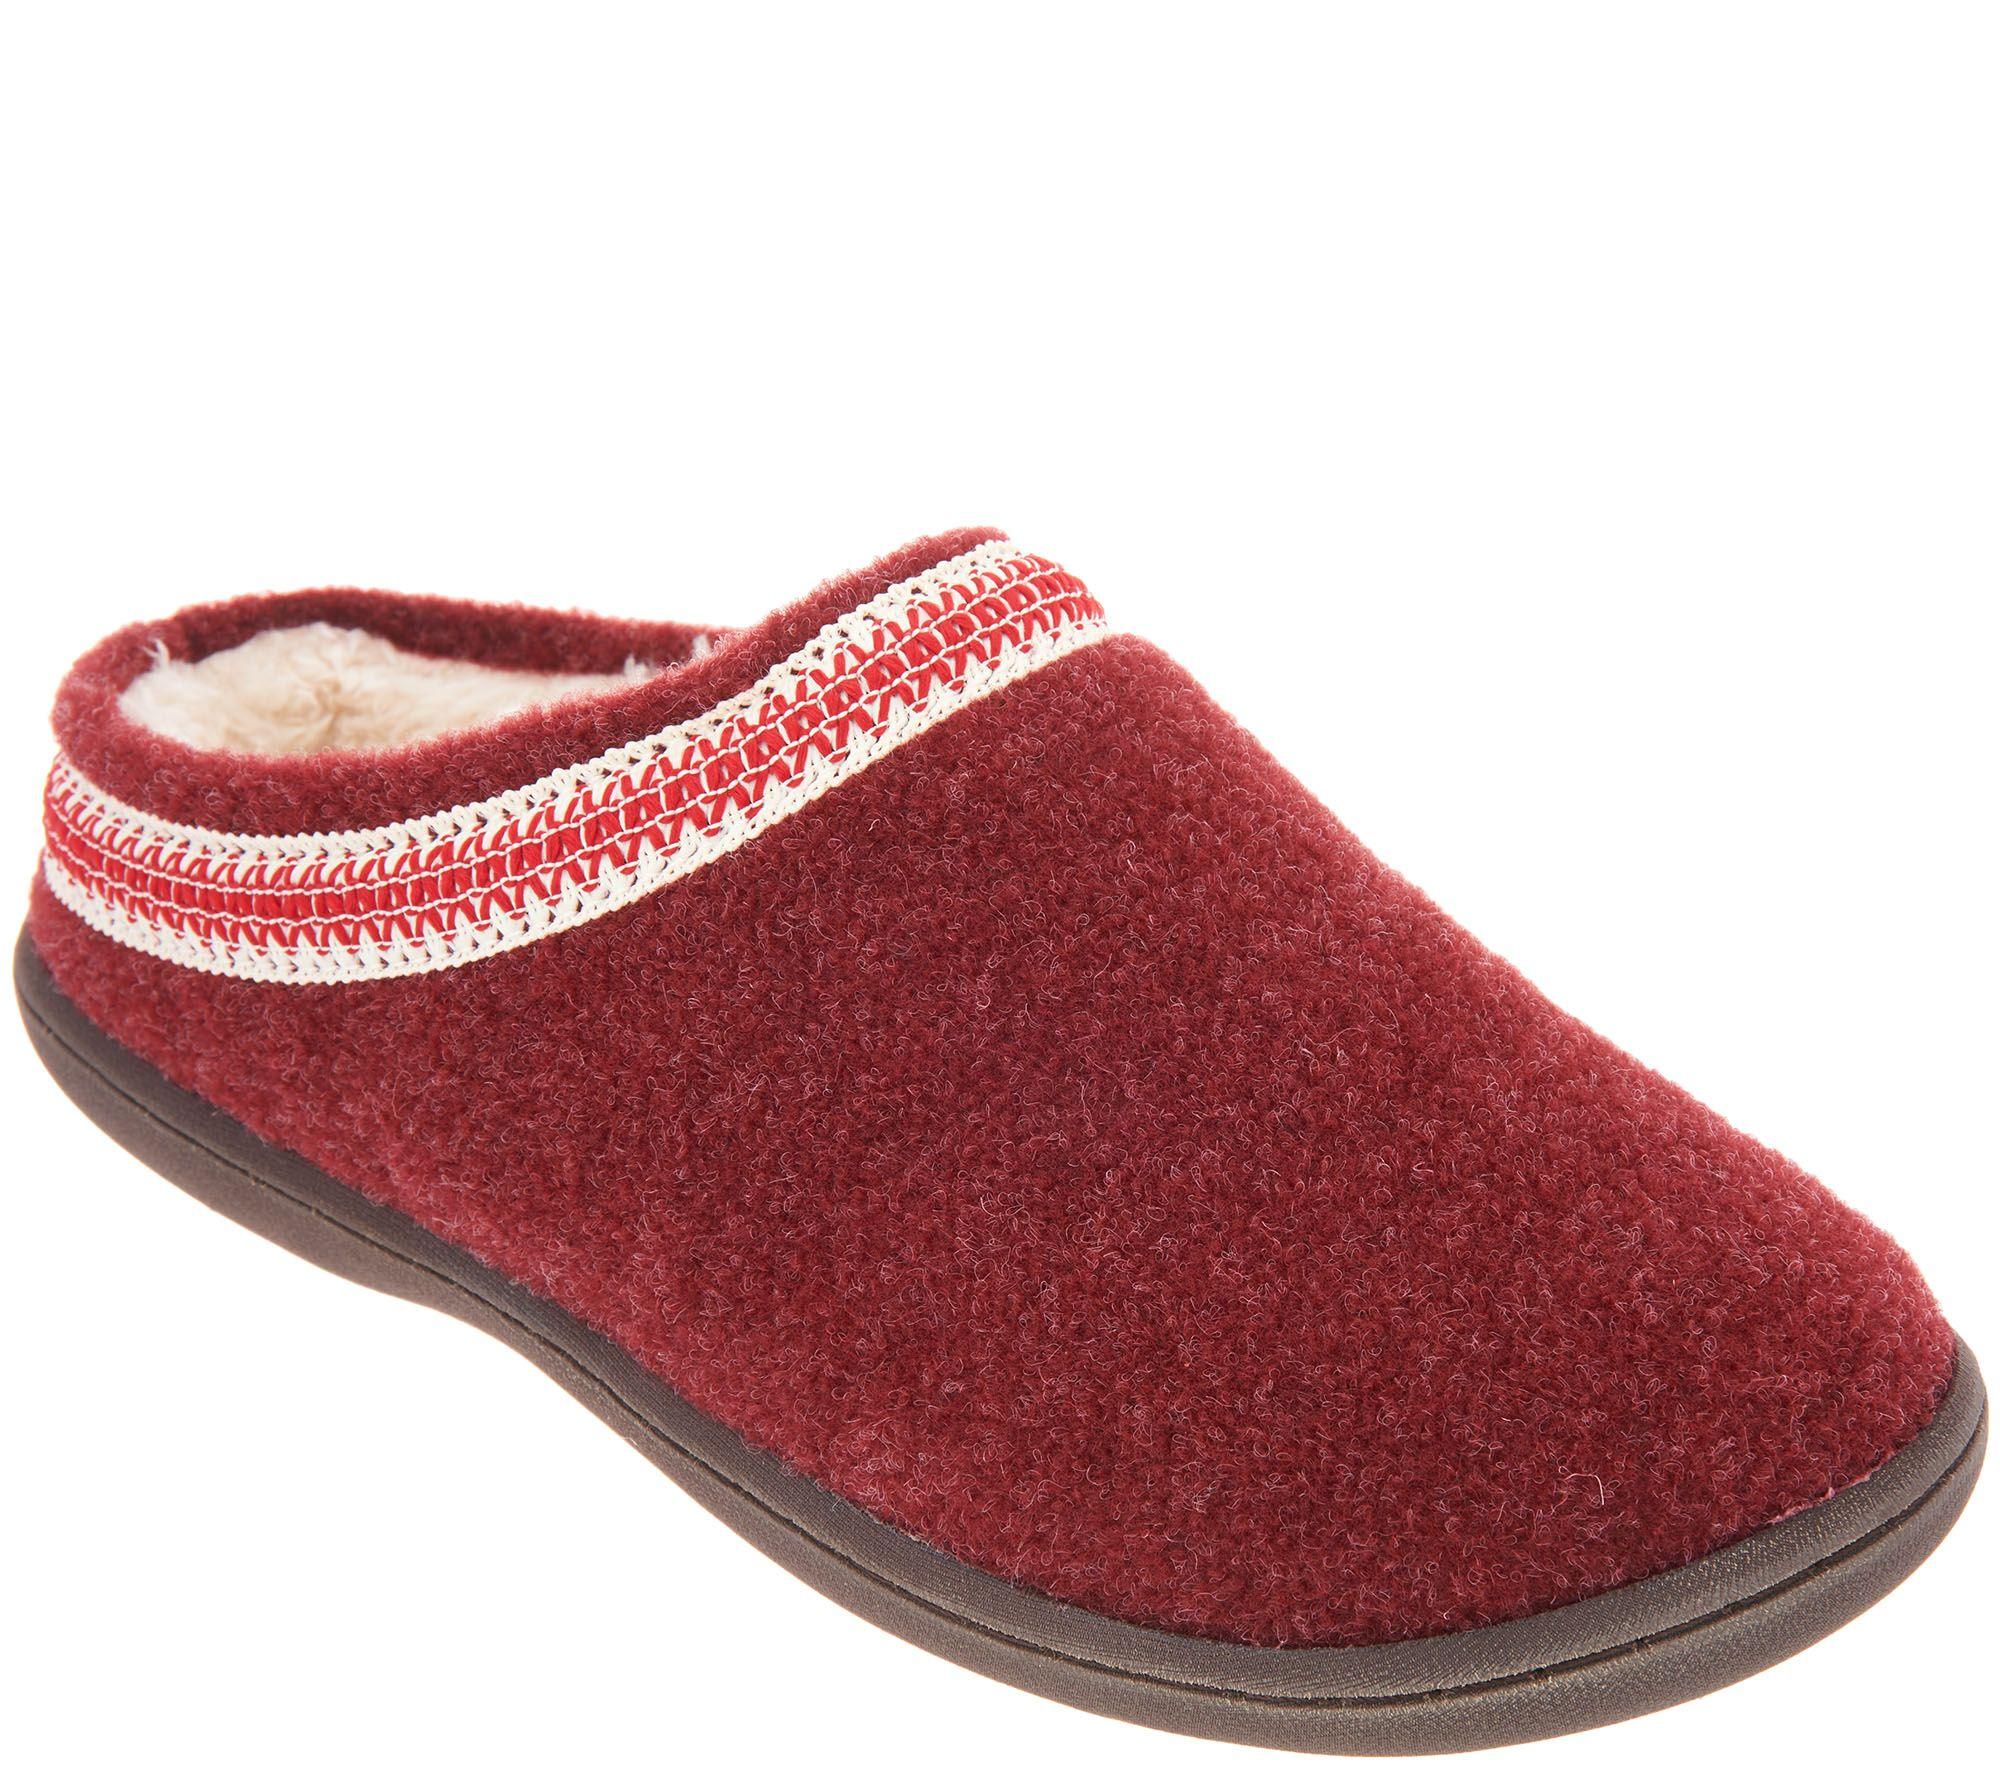 e89f603a5728a Clarks Felt Women's Slippers with Trim Detail — QVC.com